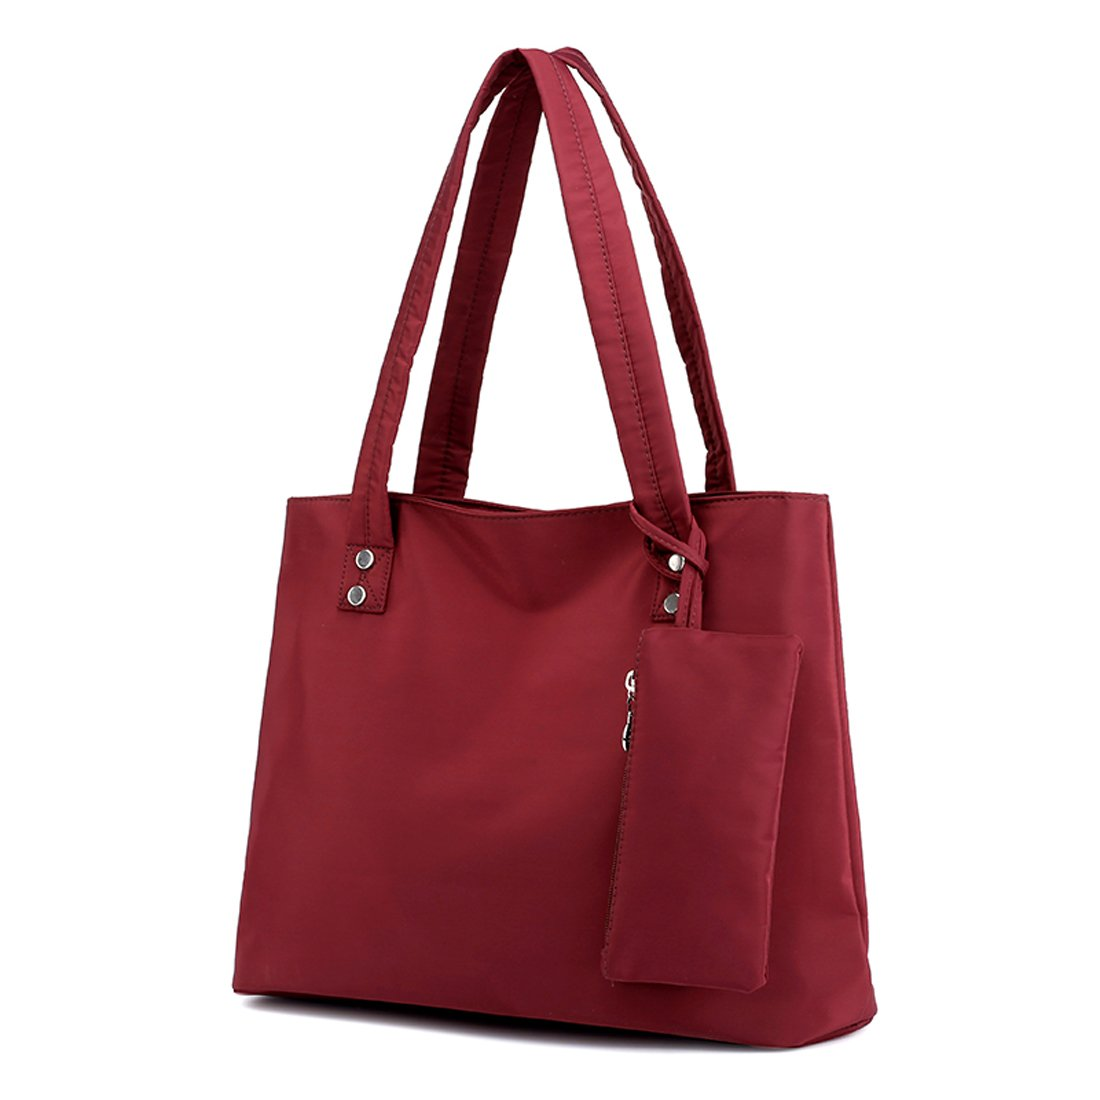 Alovhad Women Handbag Shoulder Bags Purse Waterproof Nylon Tote Travel hobo Bags Purse (Red)